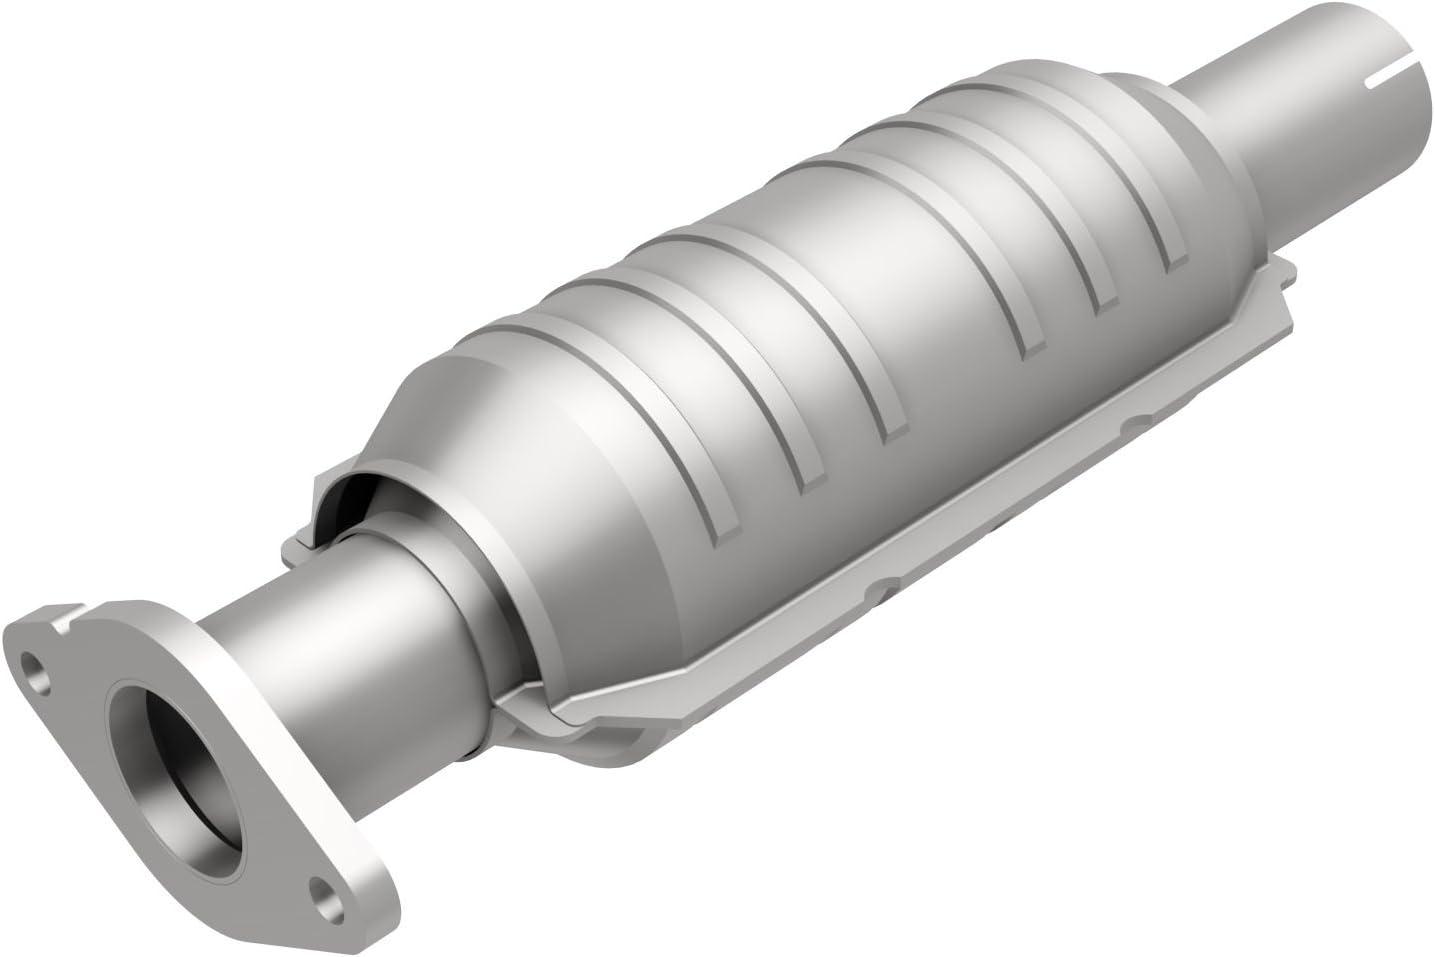 Non CARB compliant MagnaFlow 51153 Direct Fit Catalytic Converter